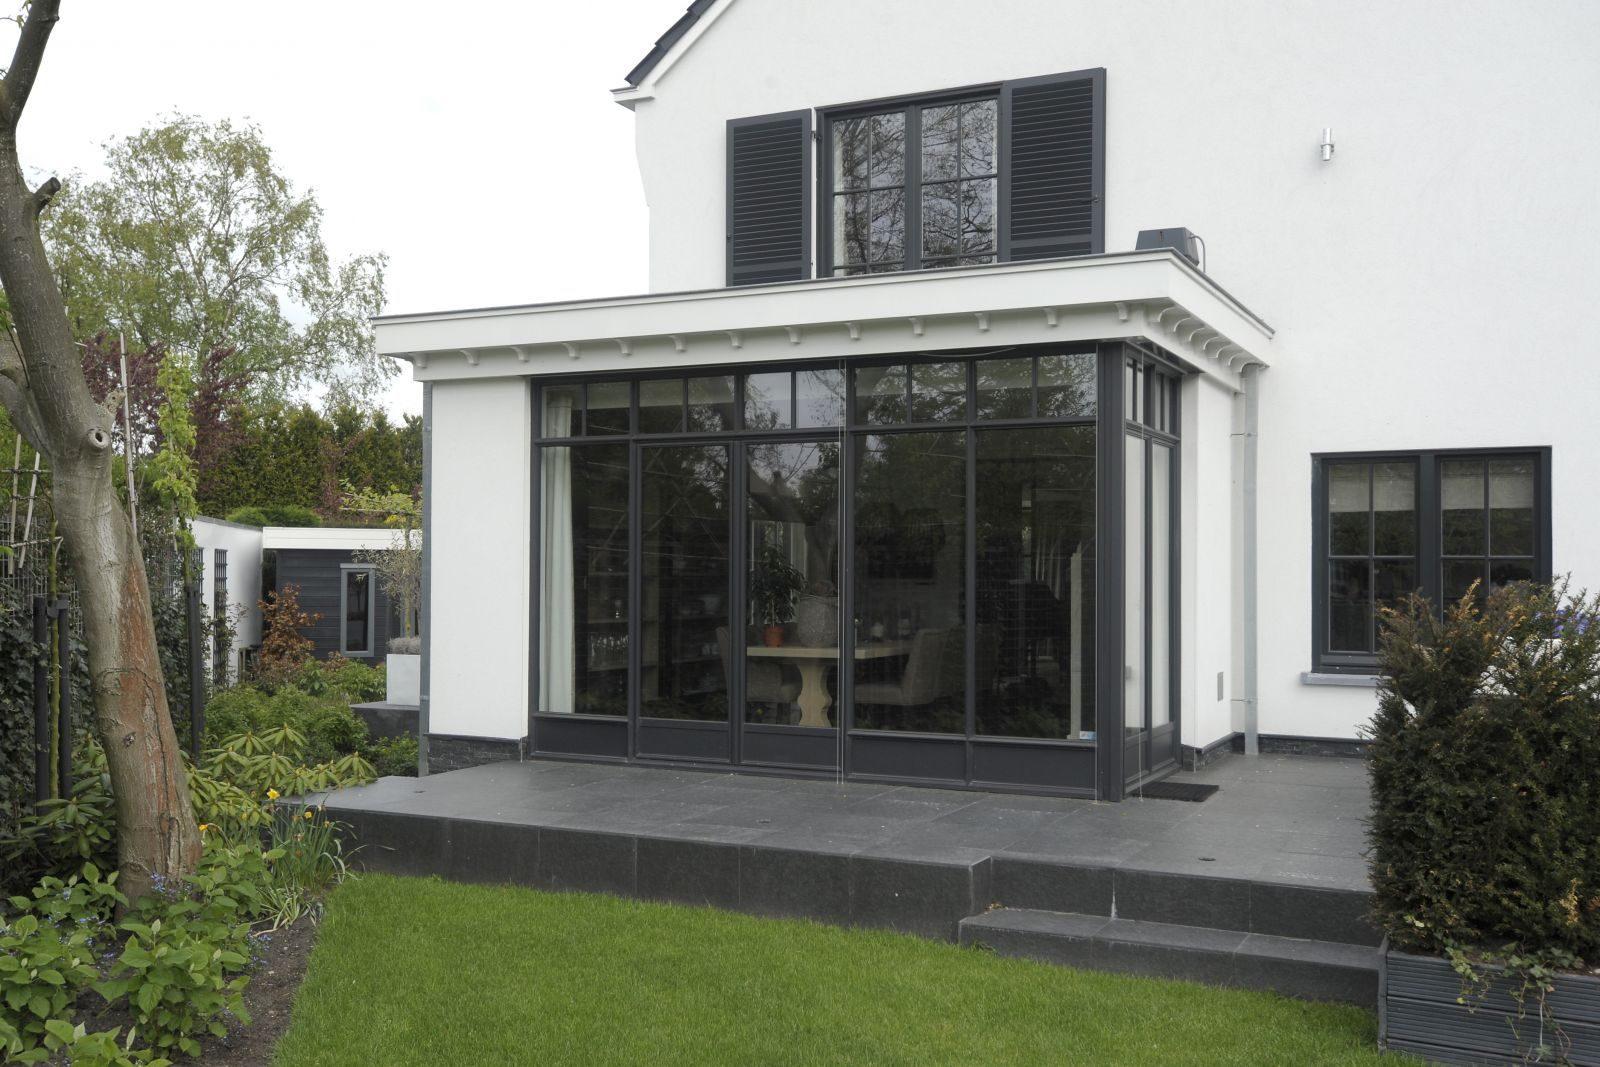 aluminium kozijnen dreumel haus pinterest anbau winterg rten und fensterrahmen. Black Bedroom Furniture Sets. Home Design Ideas